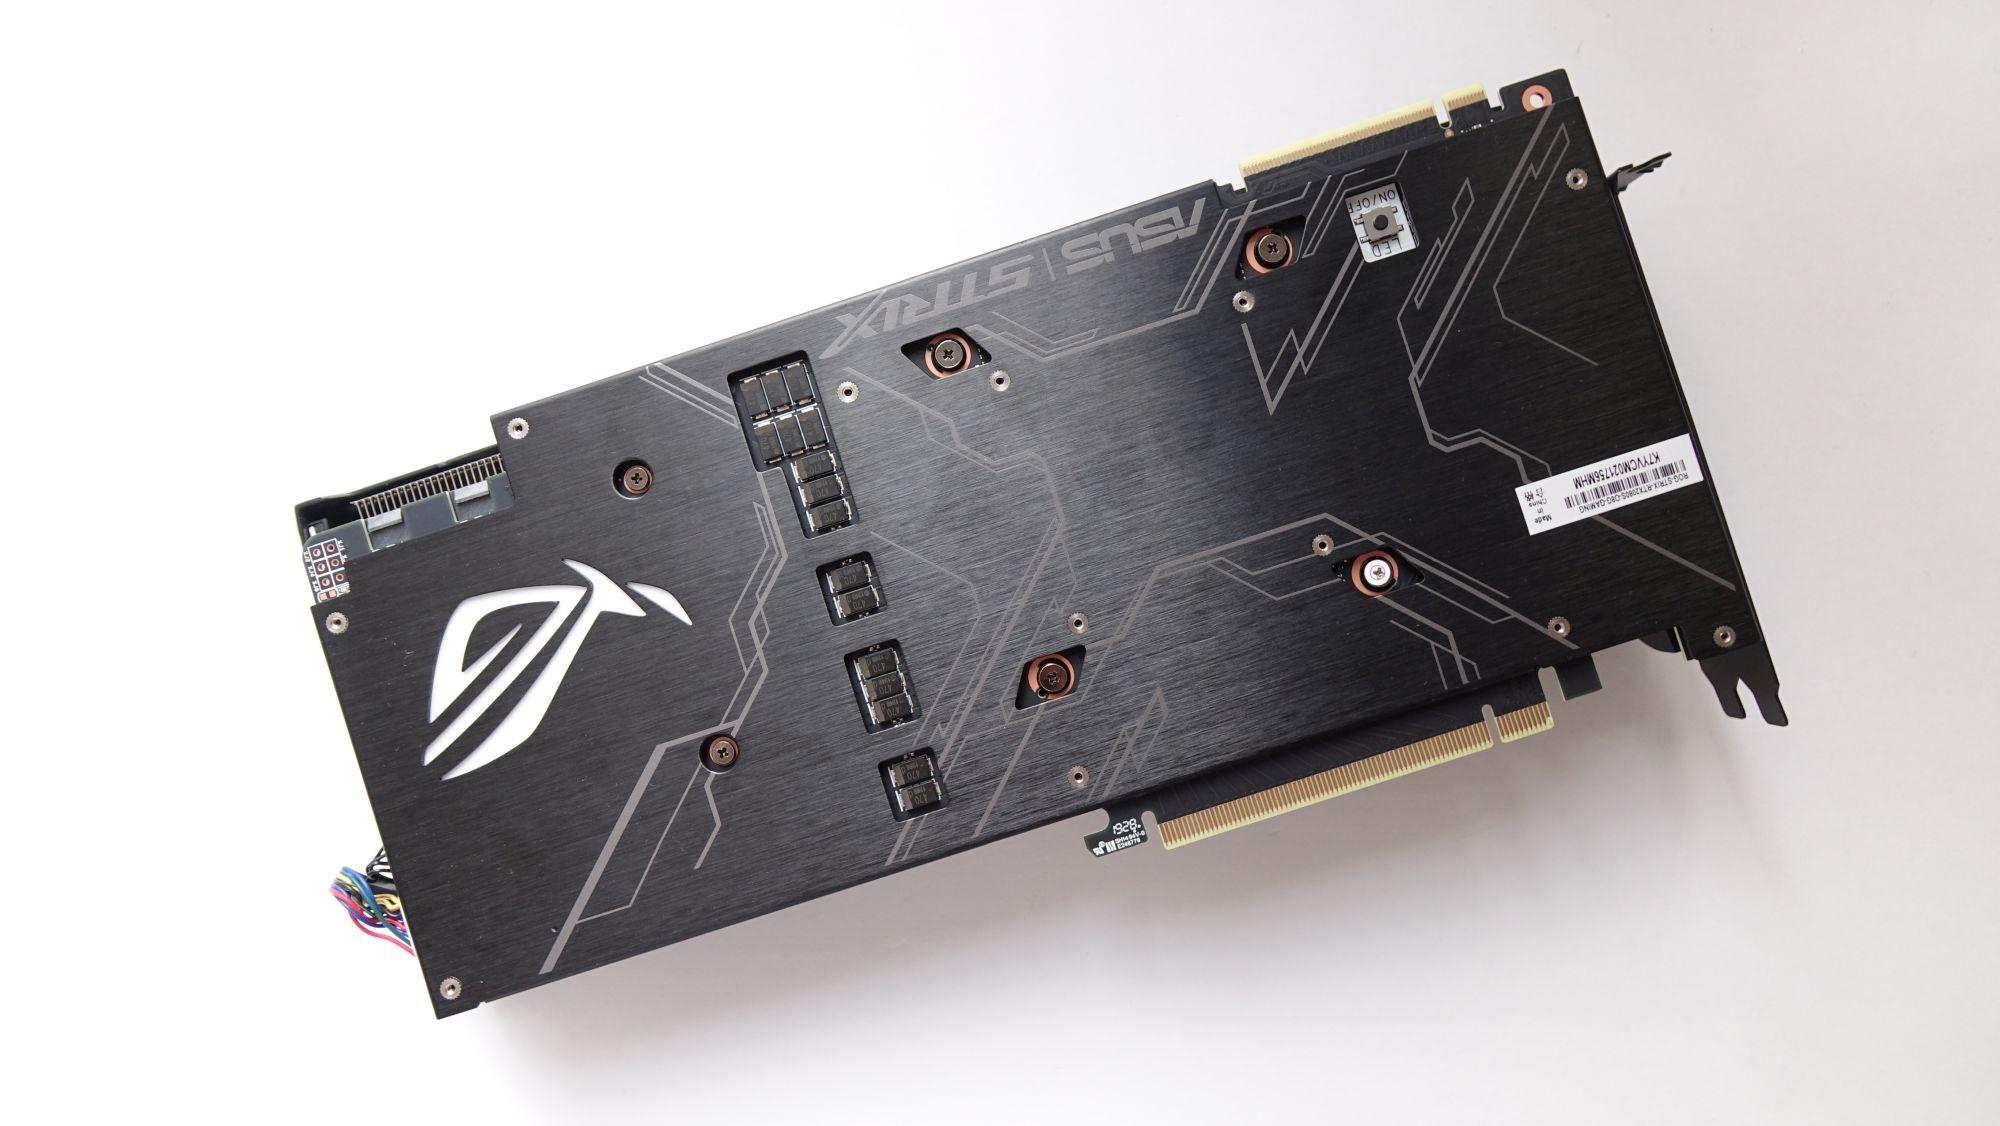 ASUS ROG Strix GeForce RTX 2080 Super силовая пластина